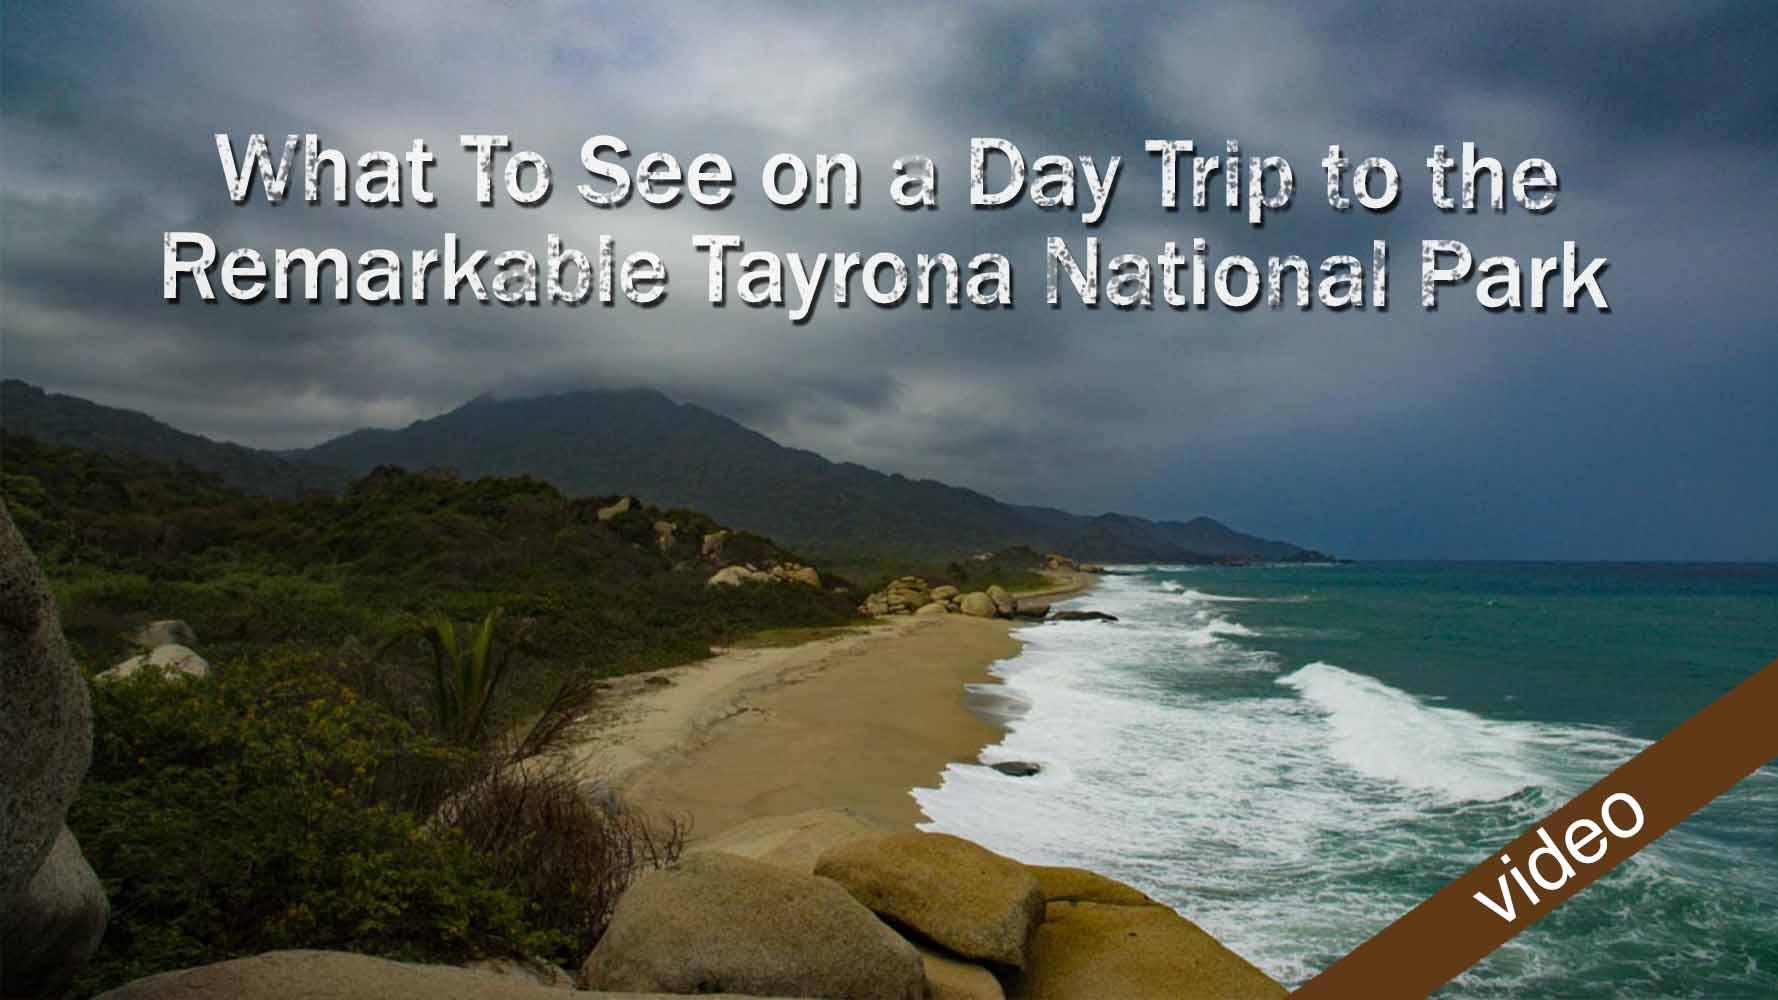 Tayrona National Park